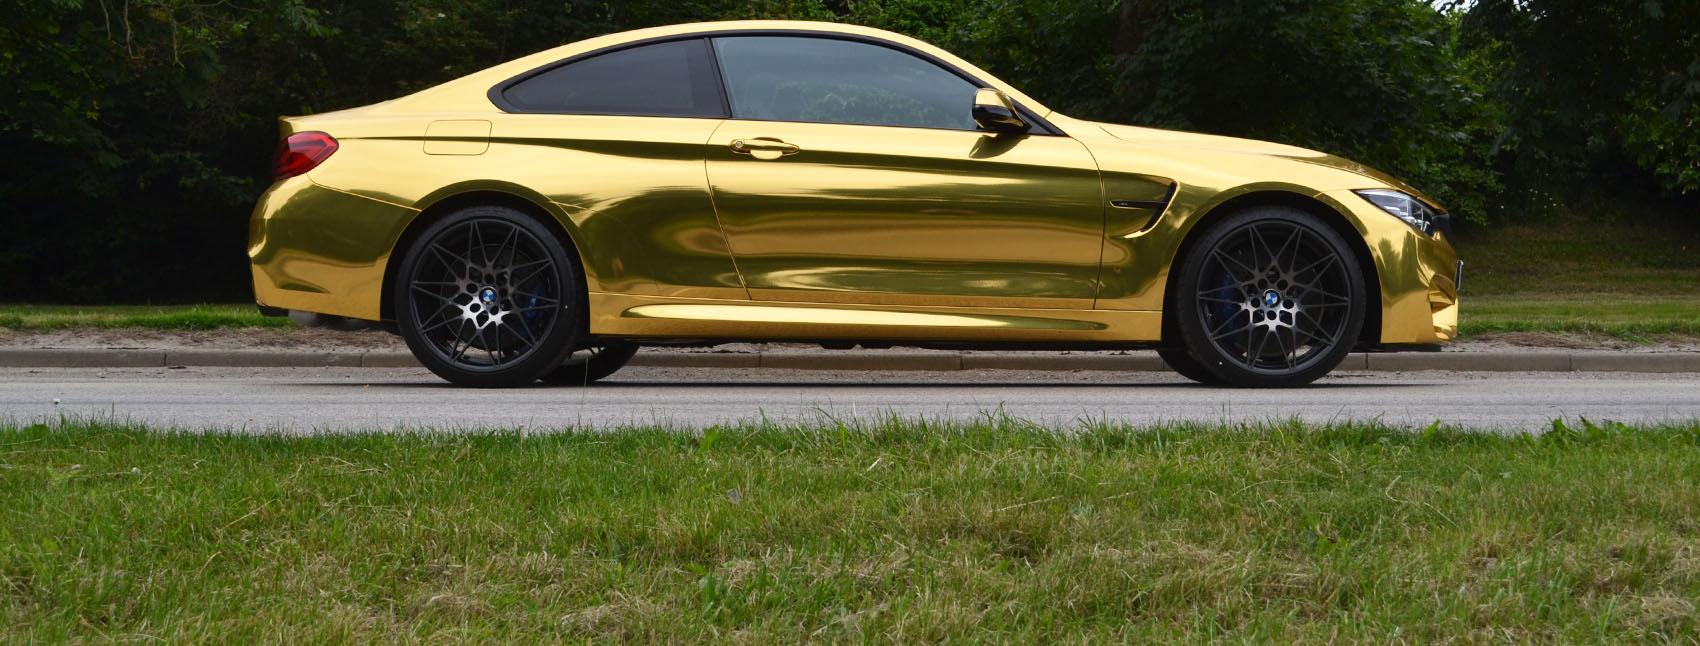 BMW M4 Case Study